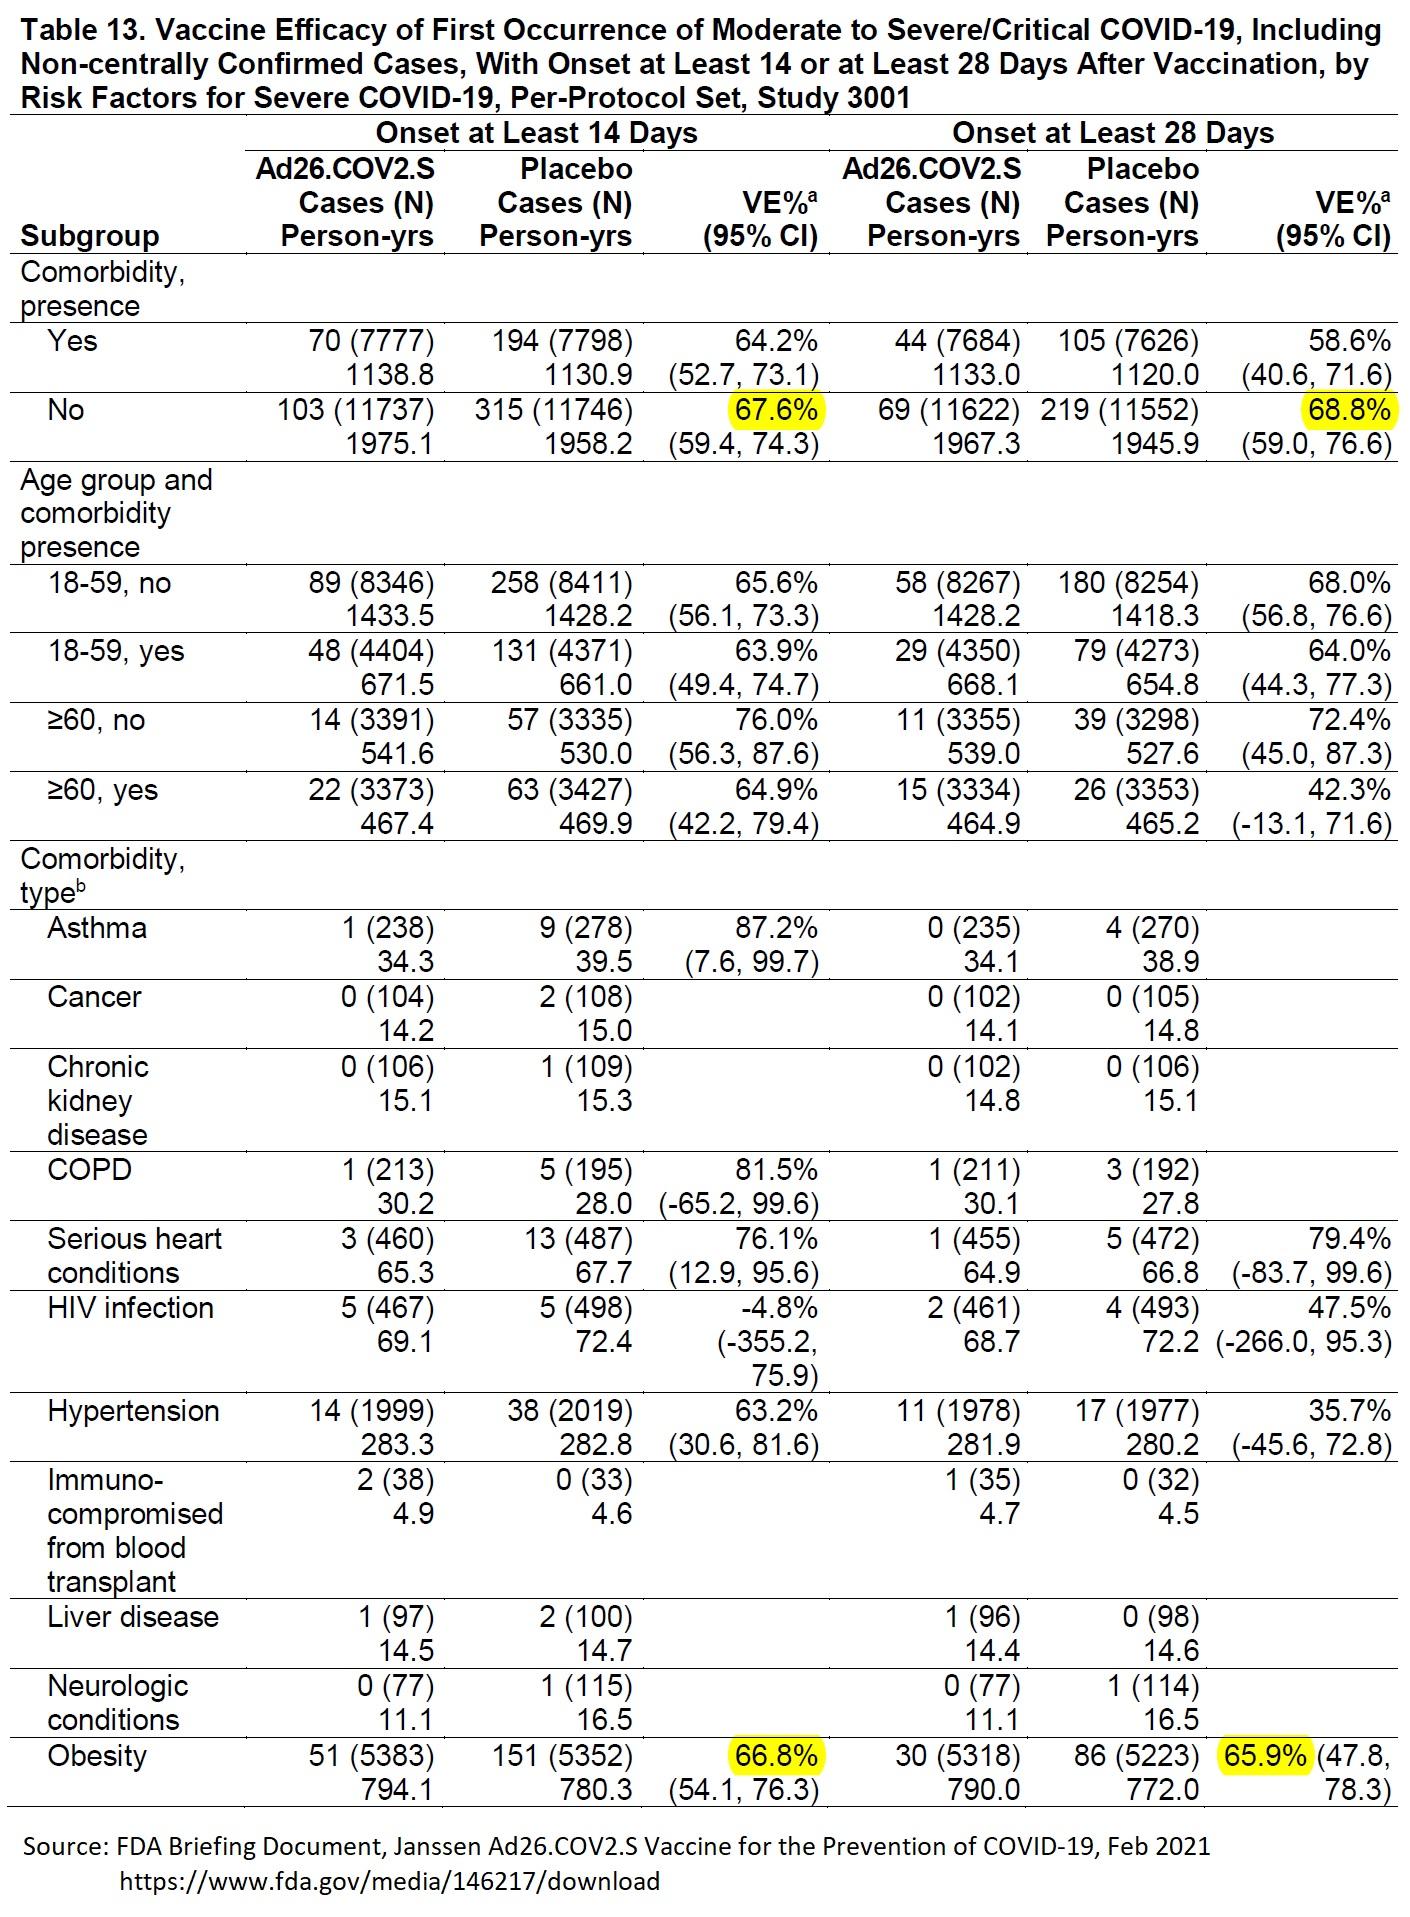 J&J COVID-19 Vaccine Efficacy, Subgroup Analysis